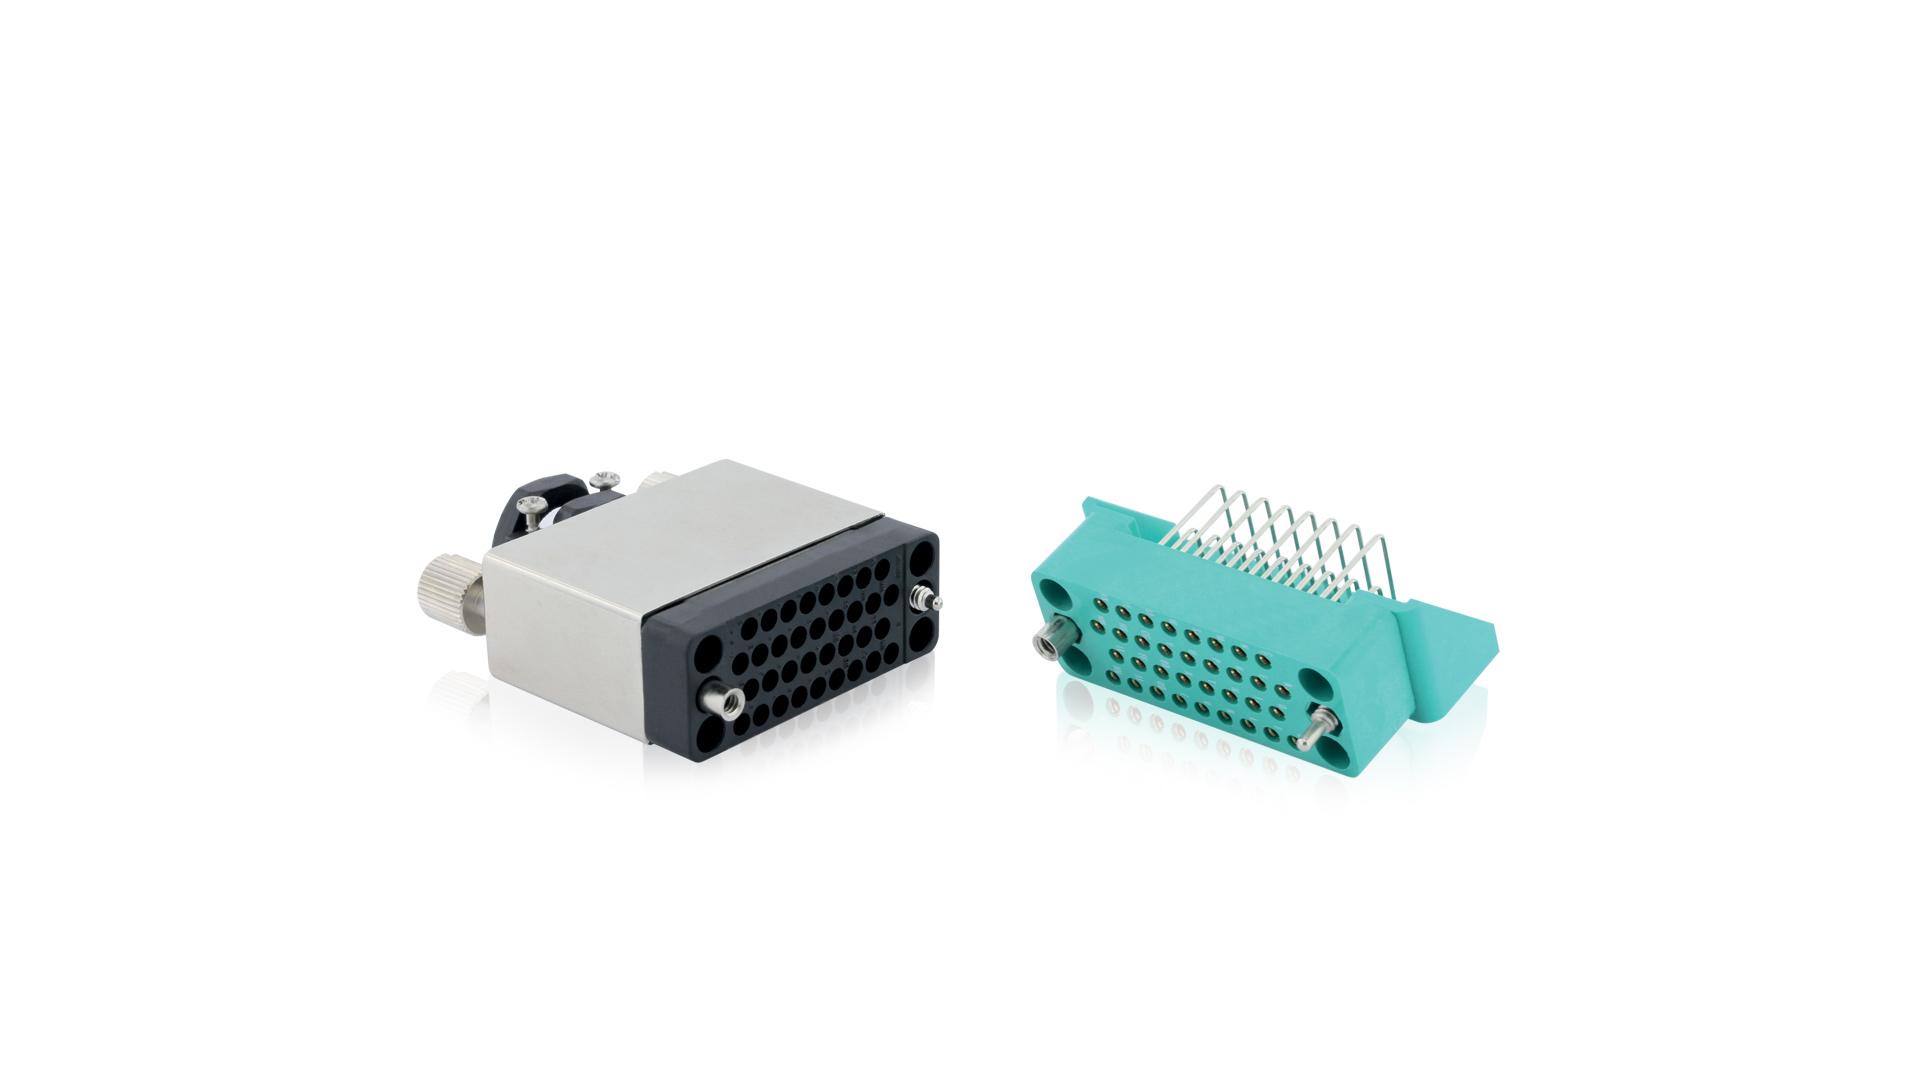 MSM series, MSM connector, MSM connectors